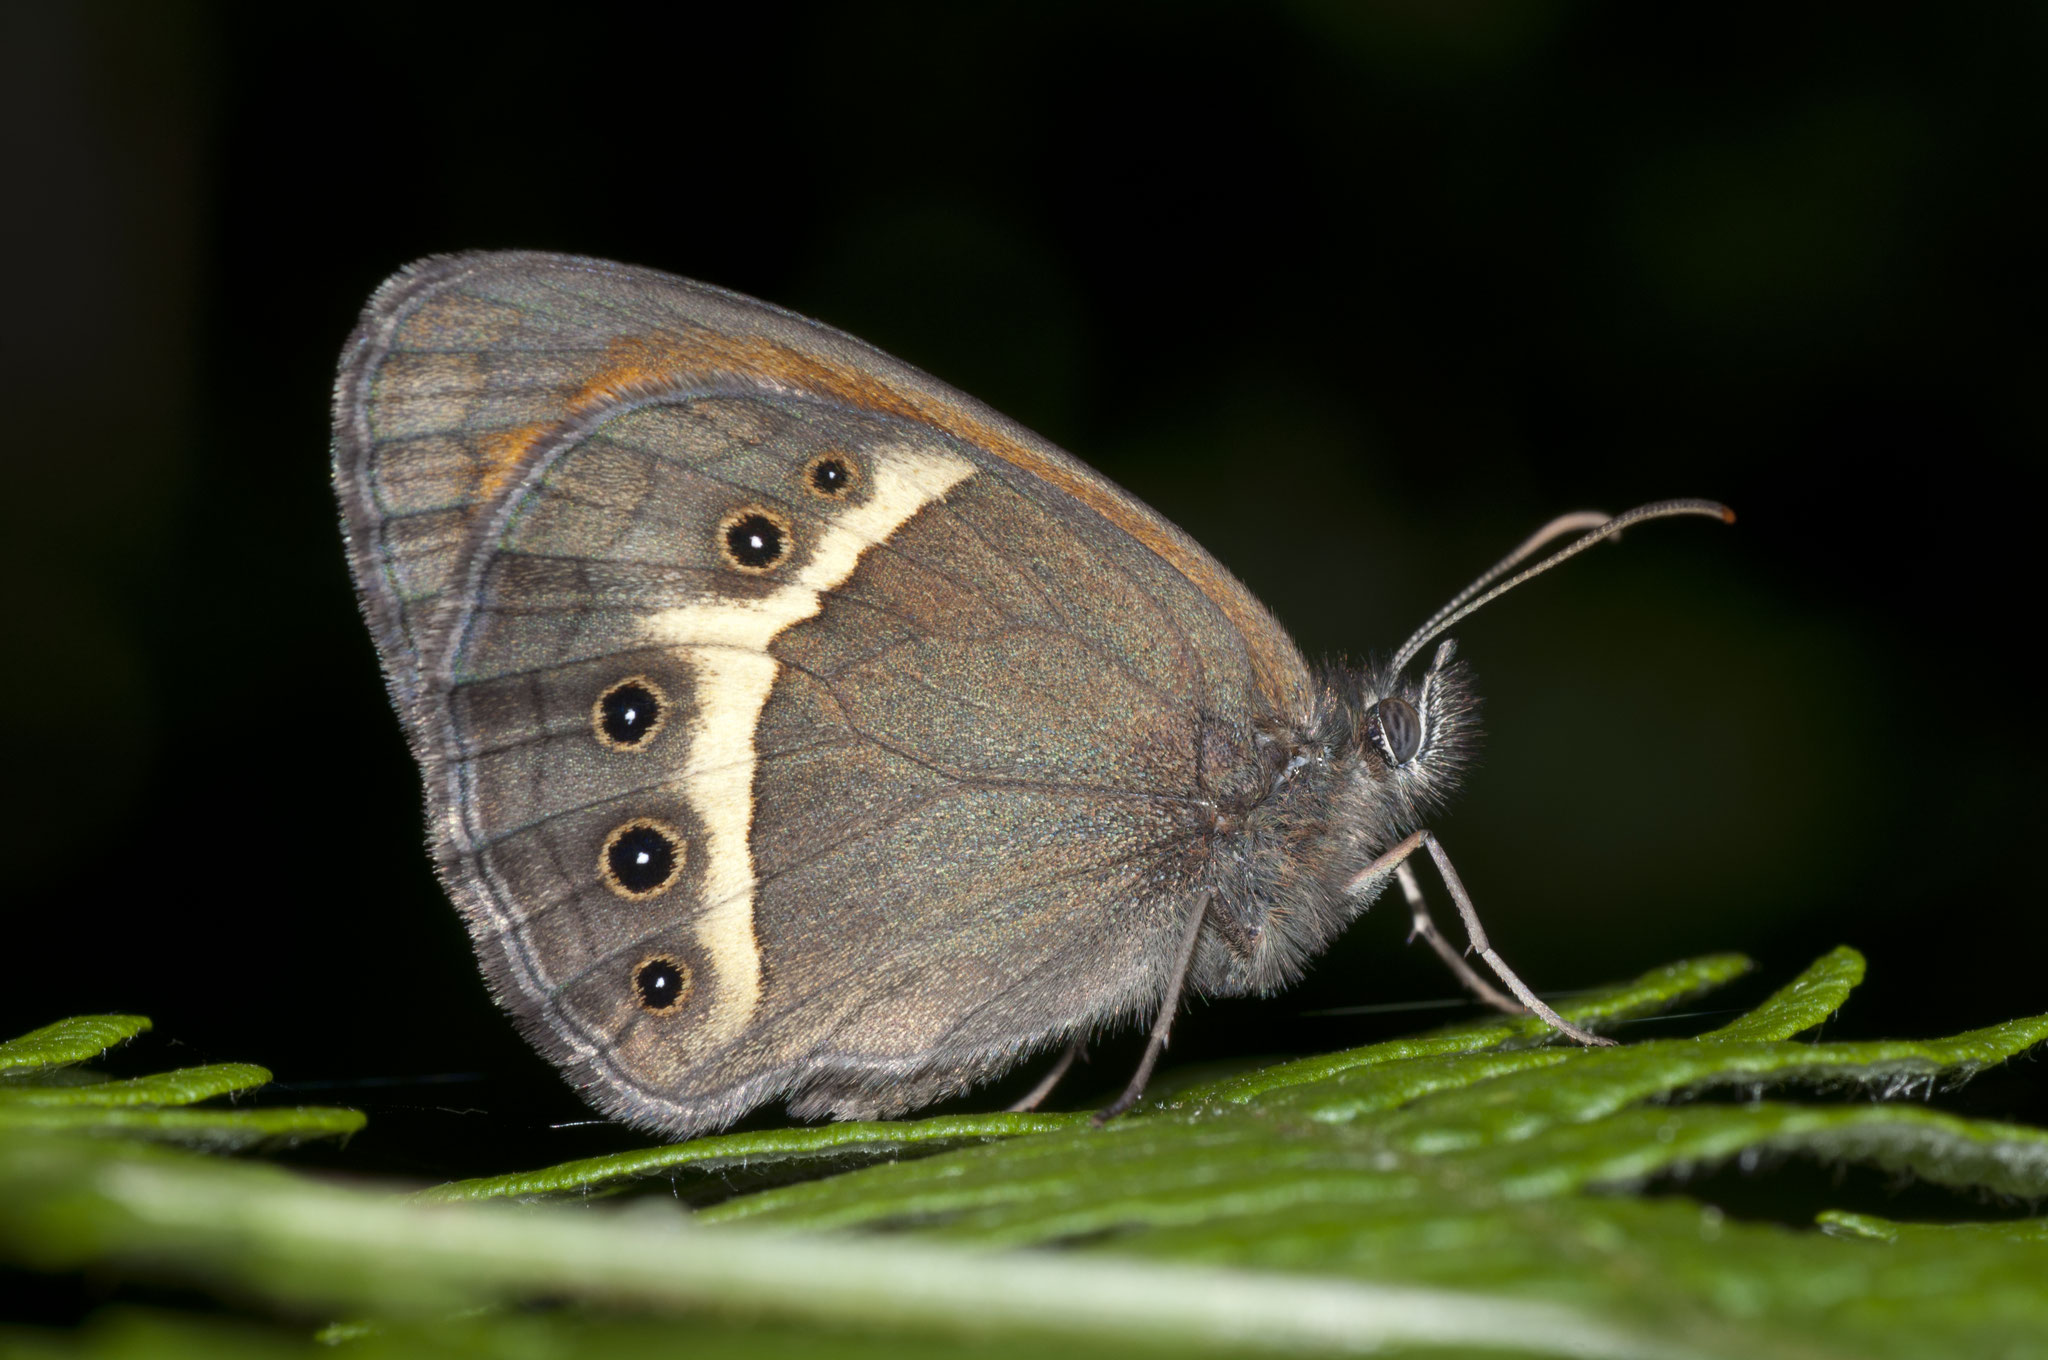 Pyronia bathseba (Lobito listado)